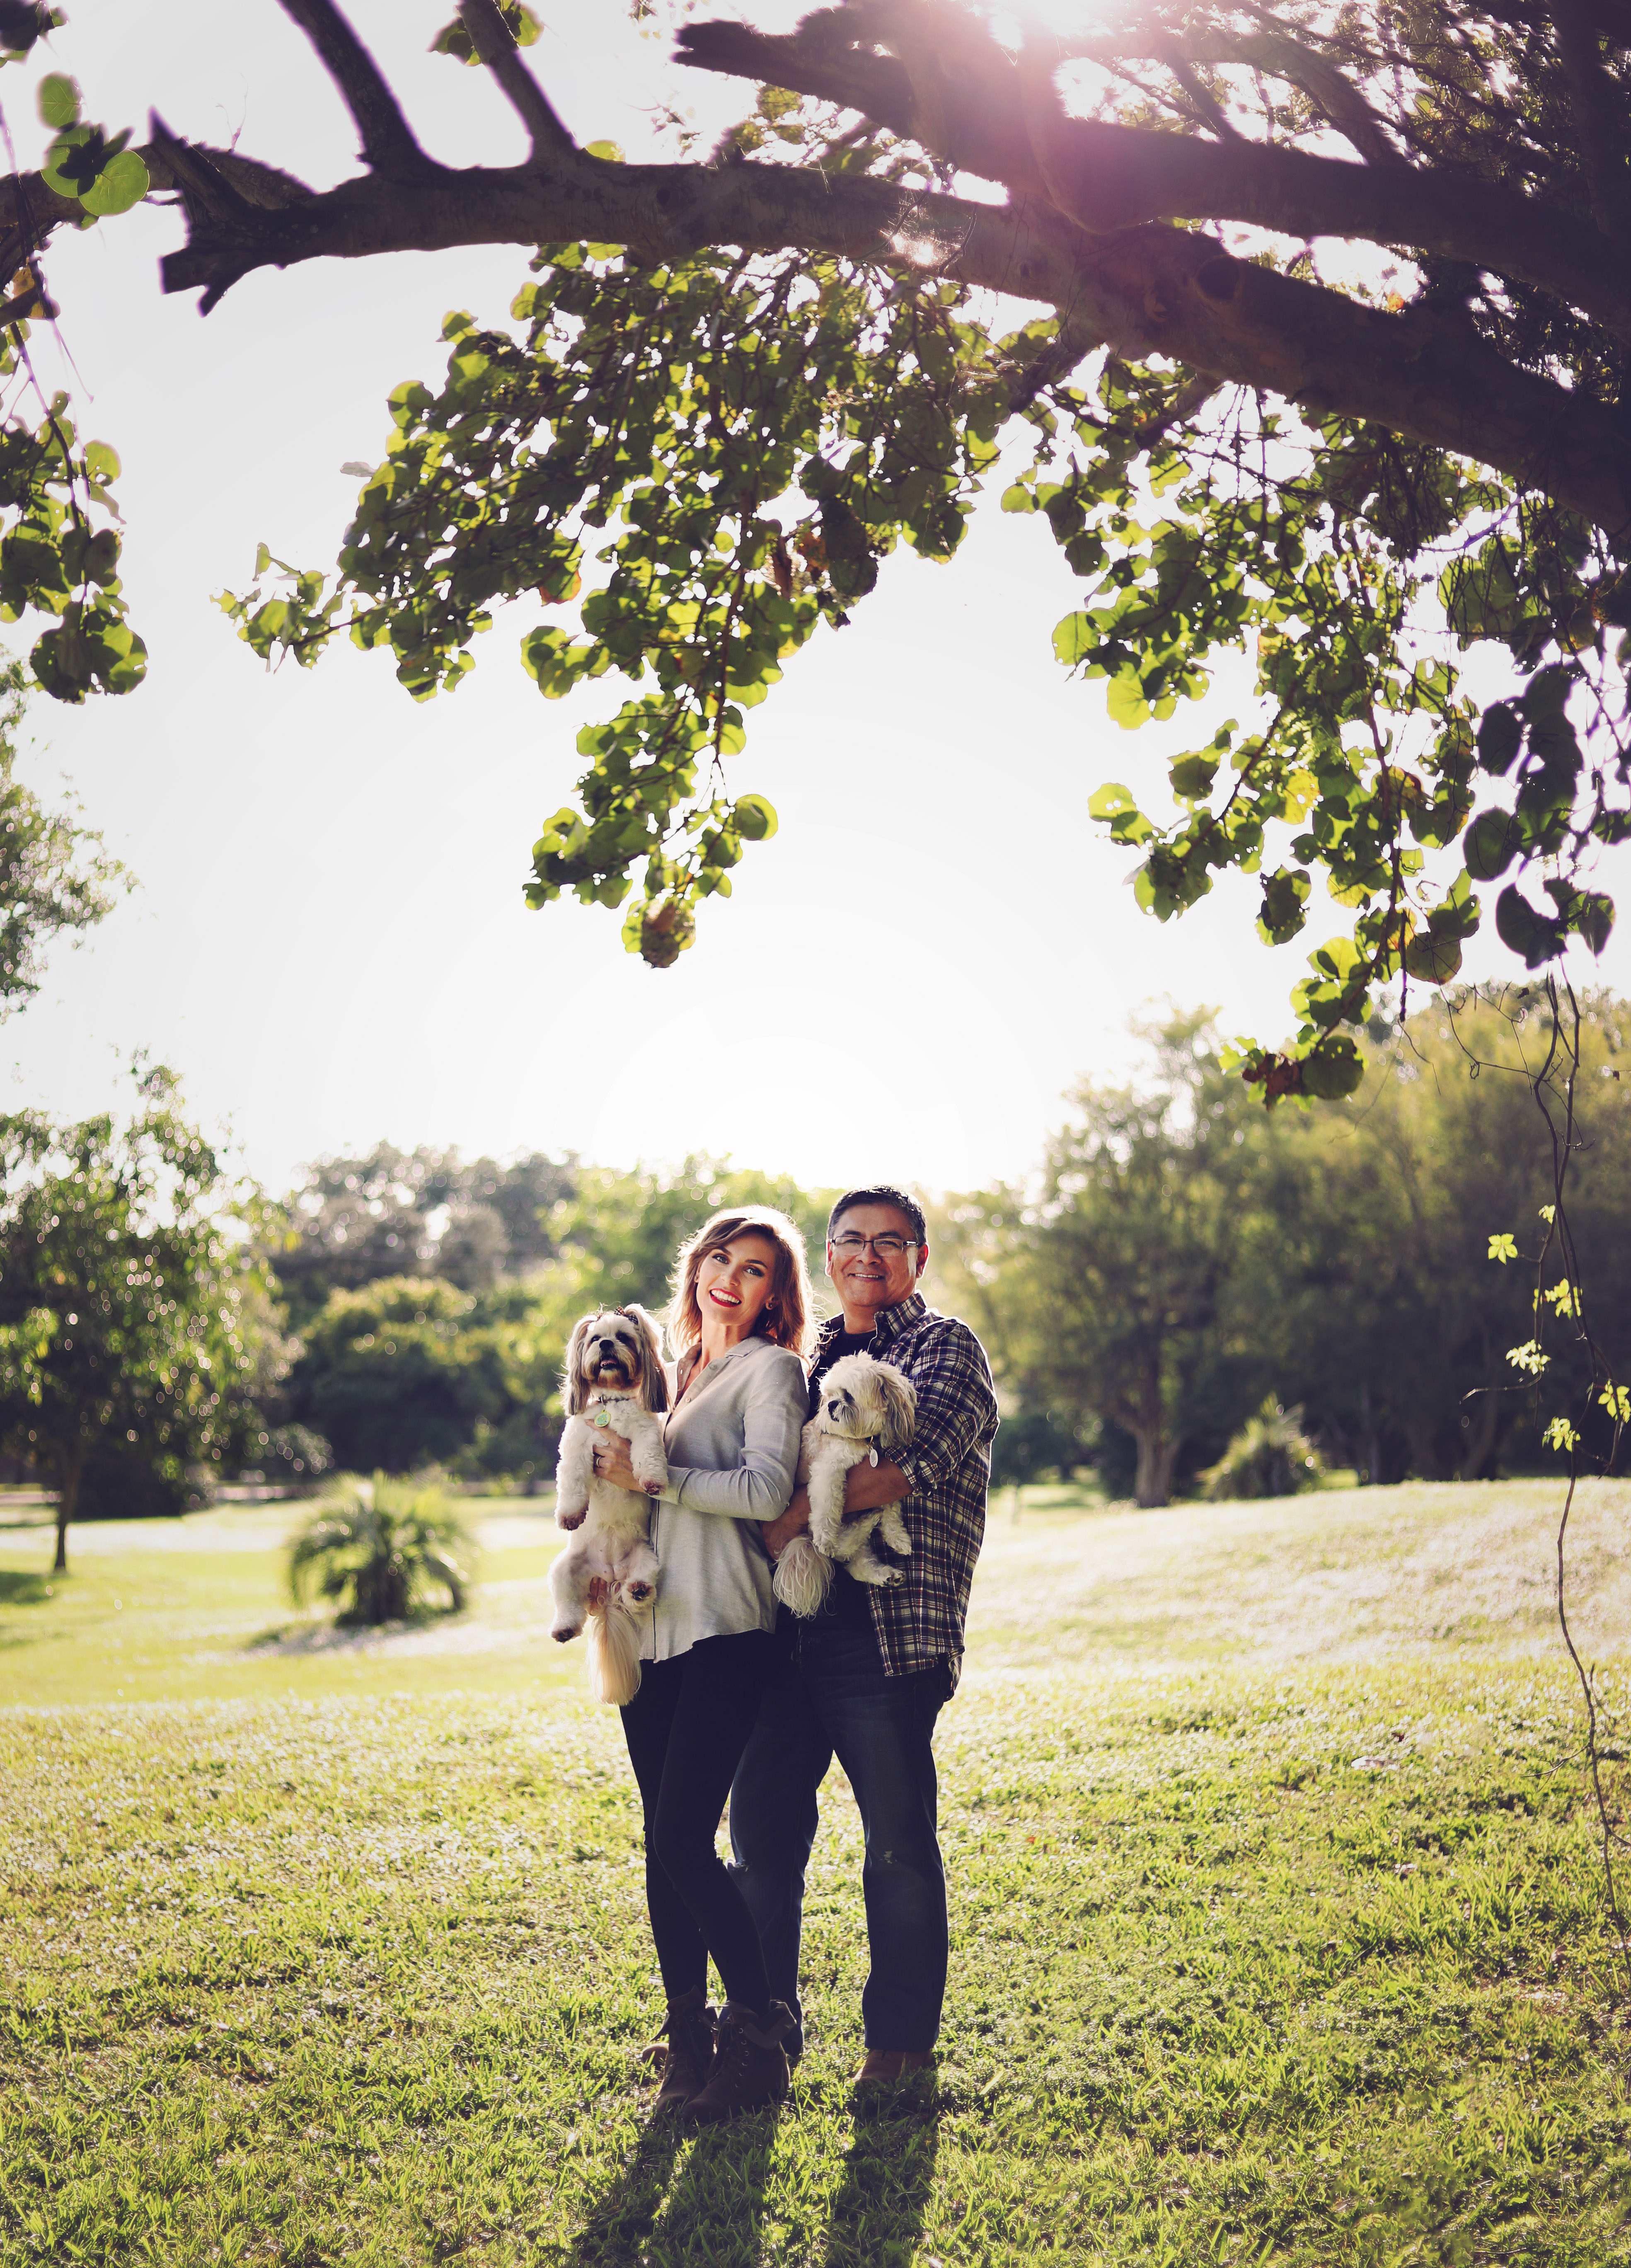 – 3 c family portrait photographer katherine eastman photography miami florida birthday The Keys fairytale maternity newborn engagement love